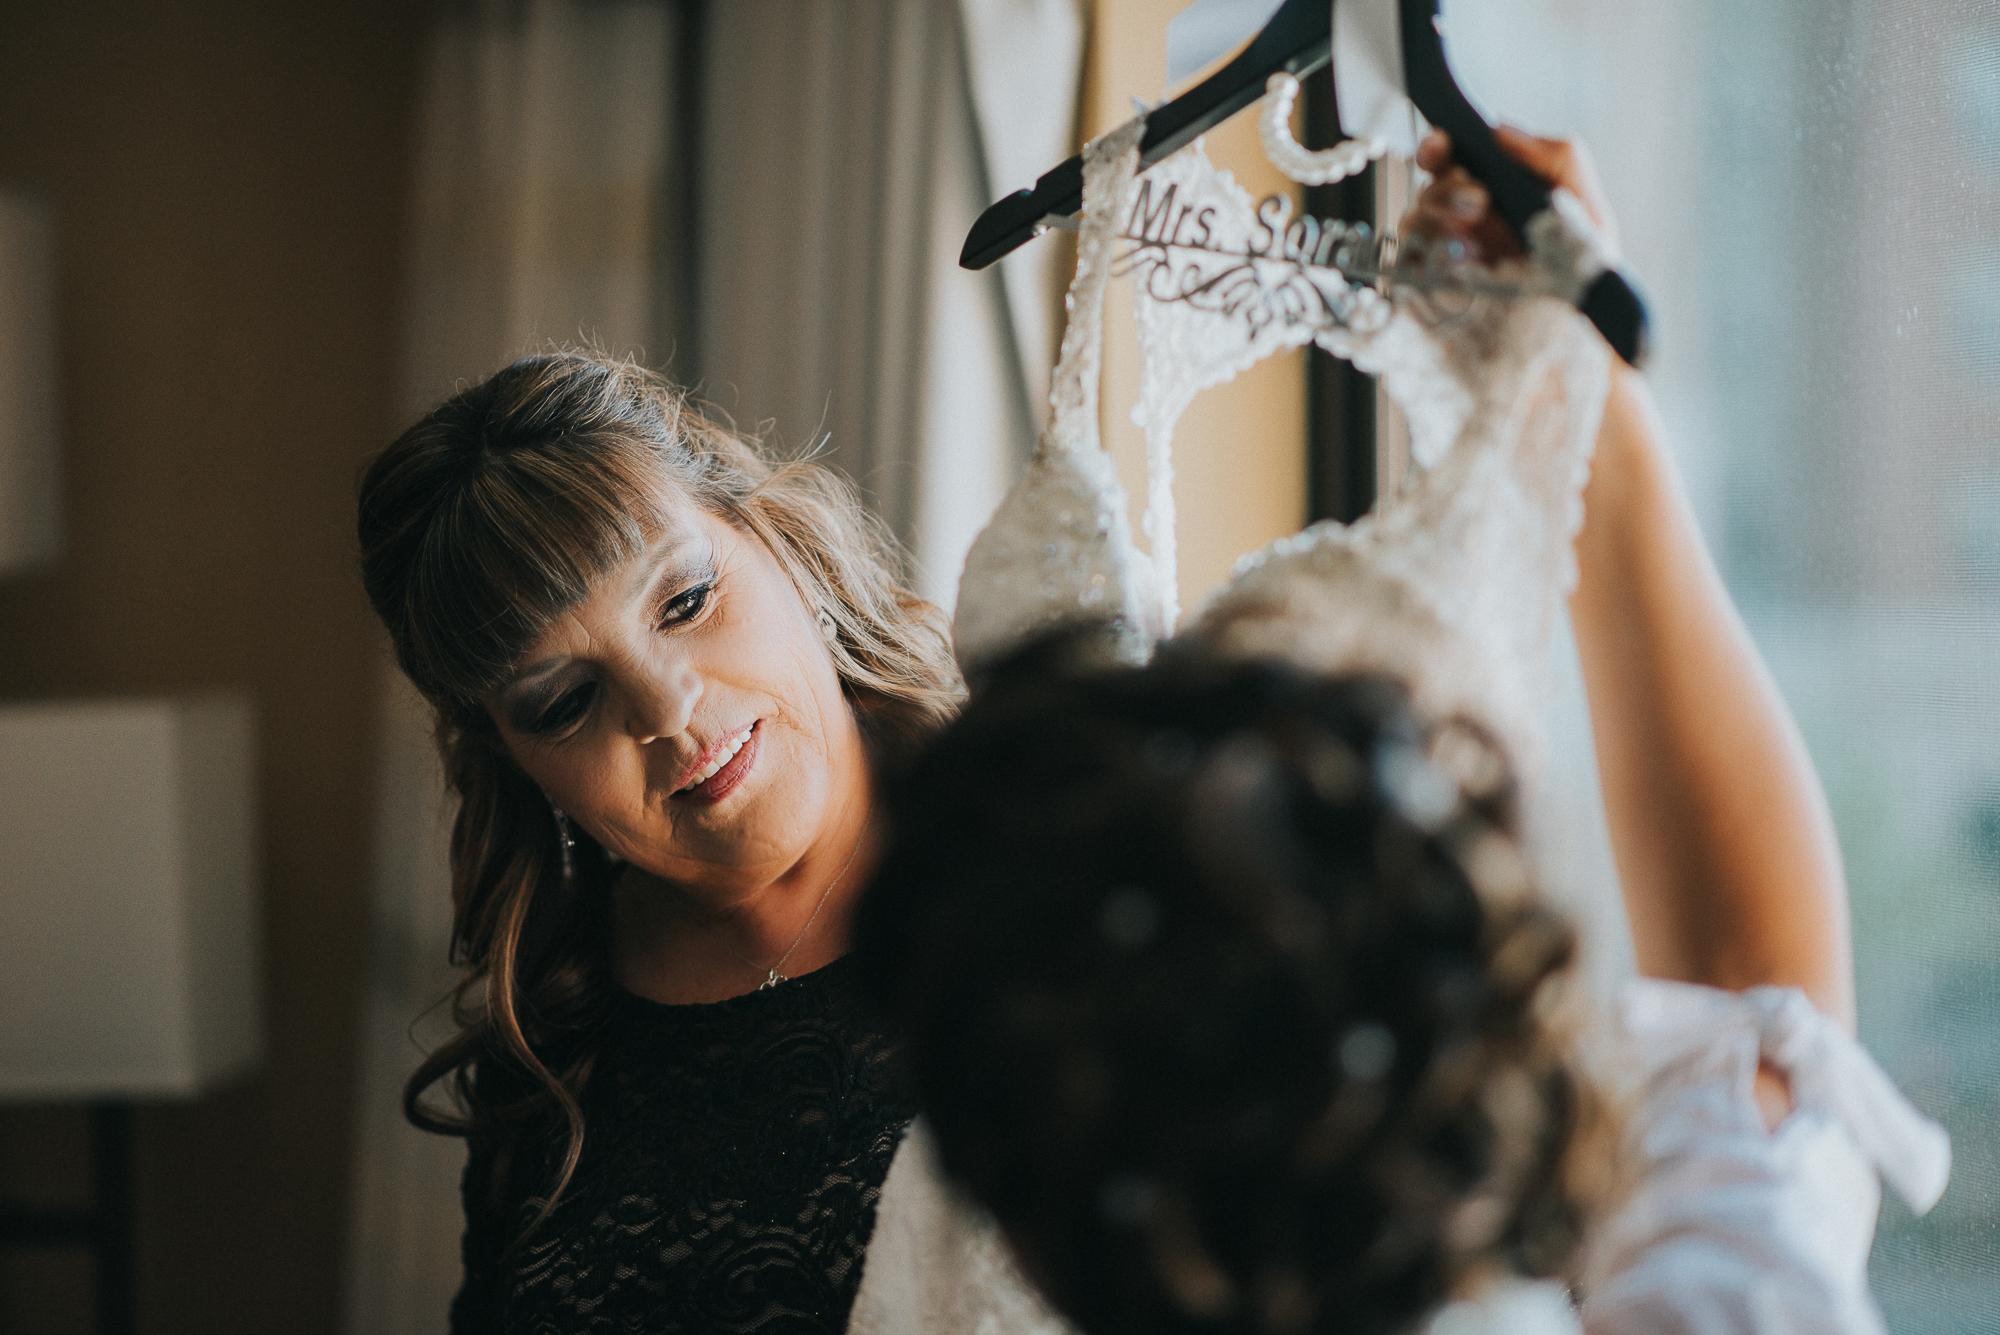 Christina-and-Gene-Wedding-Marla-Rain-Photography-70.jpg